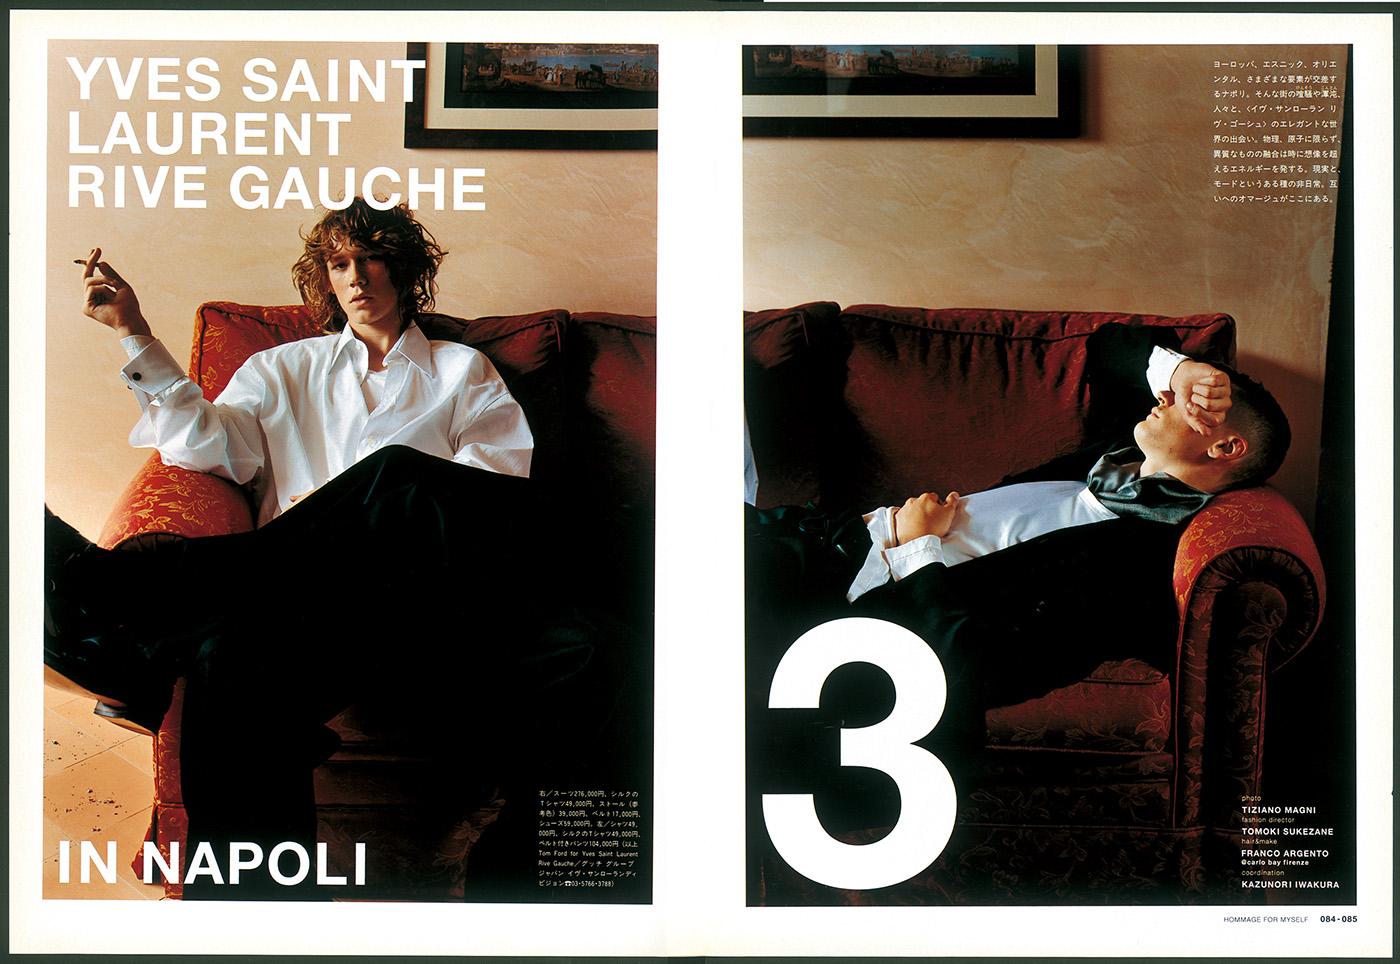 YVES SAINT LAURENT RIVE GAUCHE(BRUTUS no.510 2002/10/1) Fashion Direction/Tomoki Sukezane/Photo:Tiziano Magni/Hair&make:Franco Argento/Coordination:Kazunori Iwakura